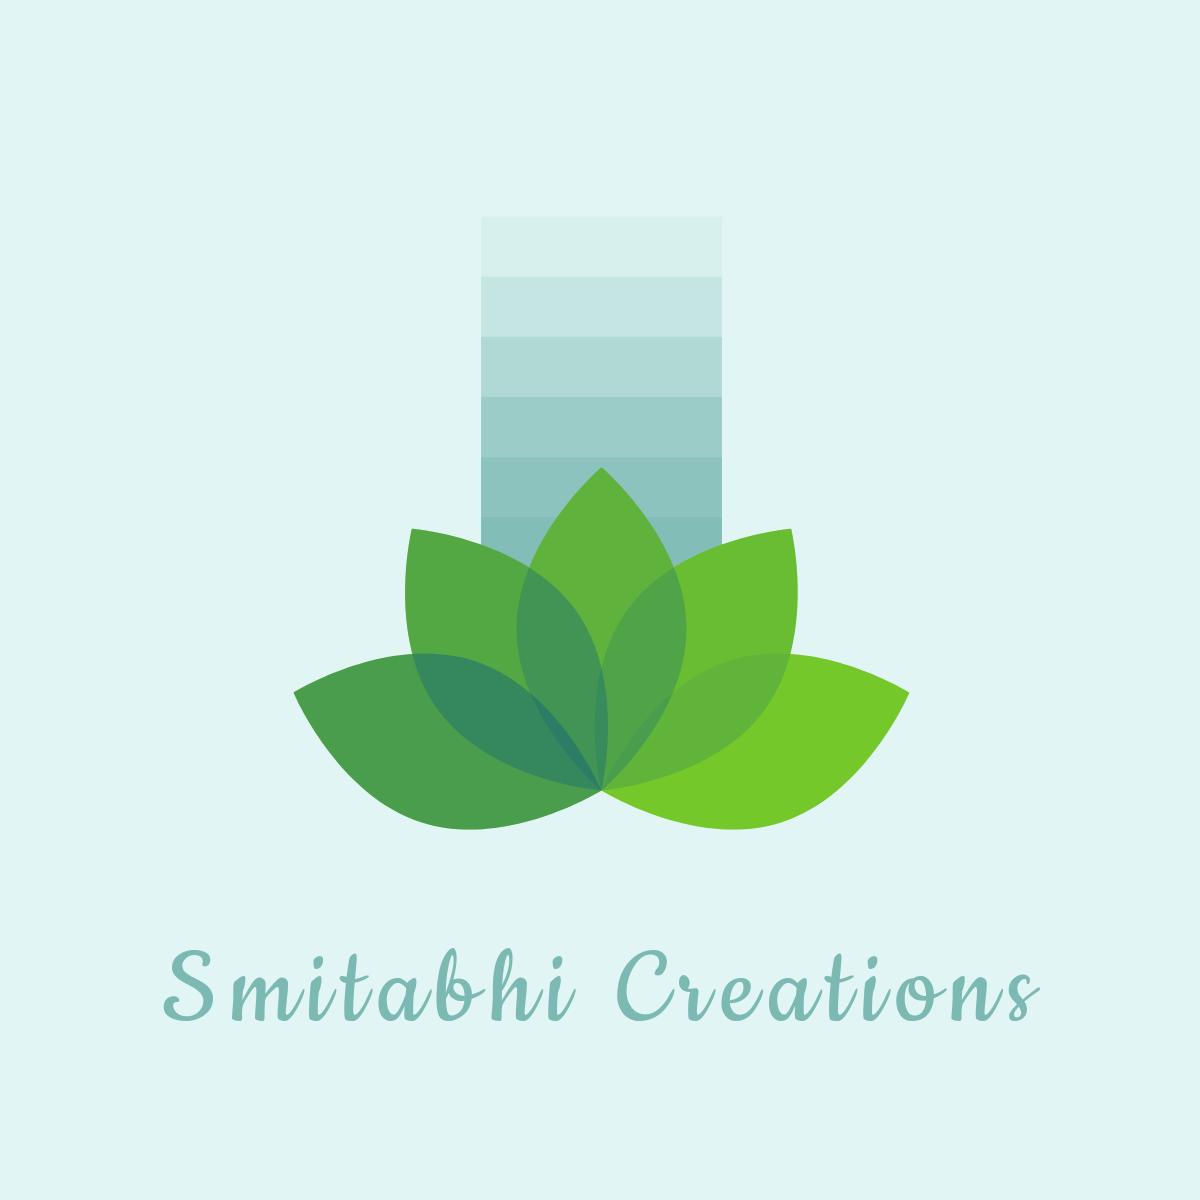 Smitabhi Creations image